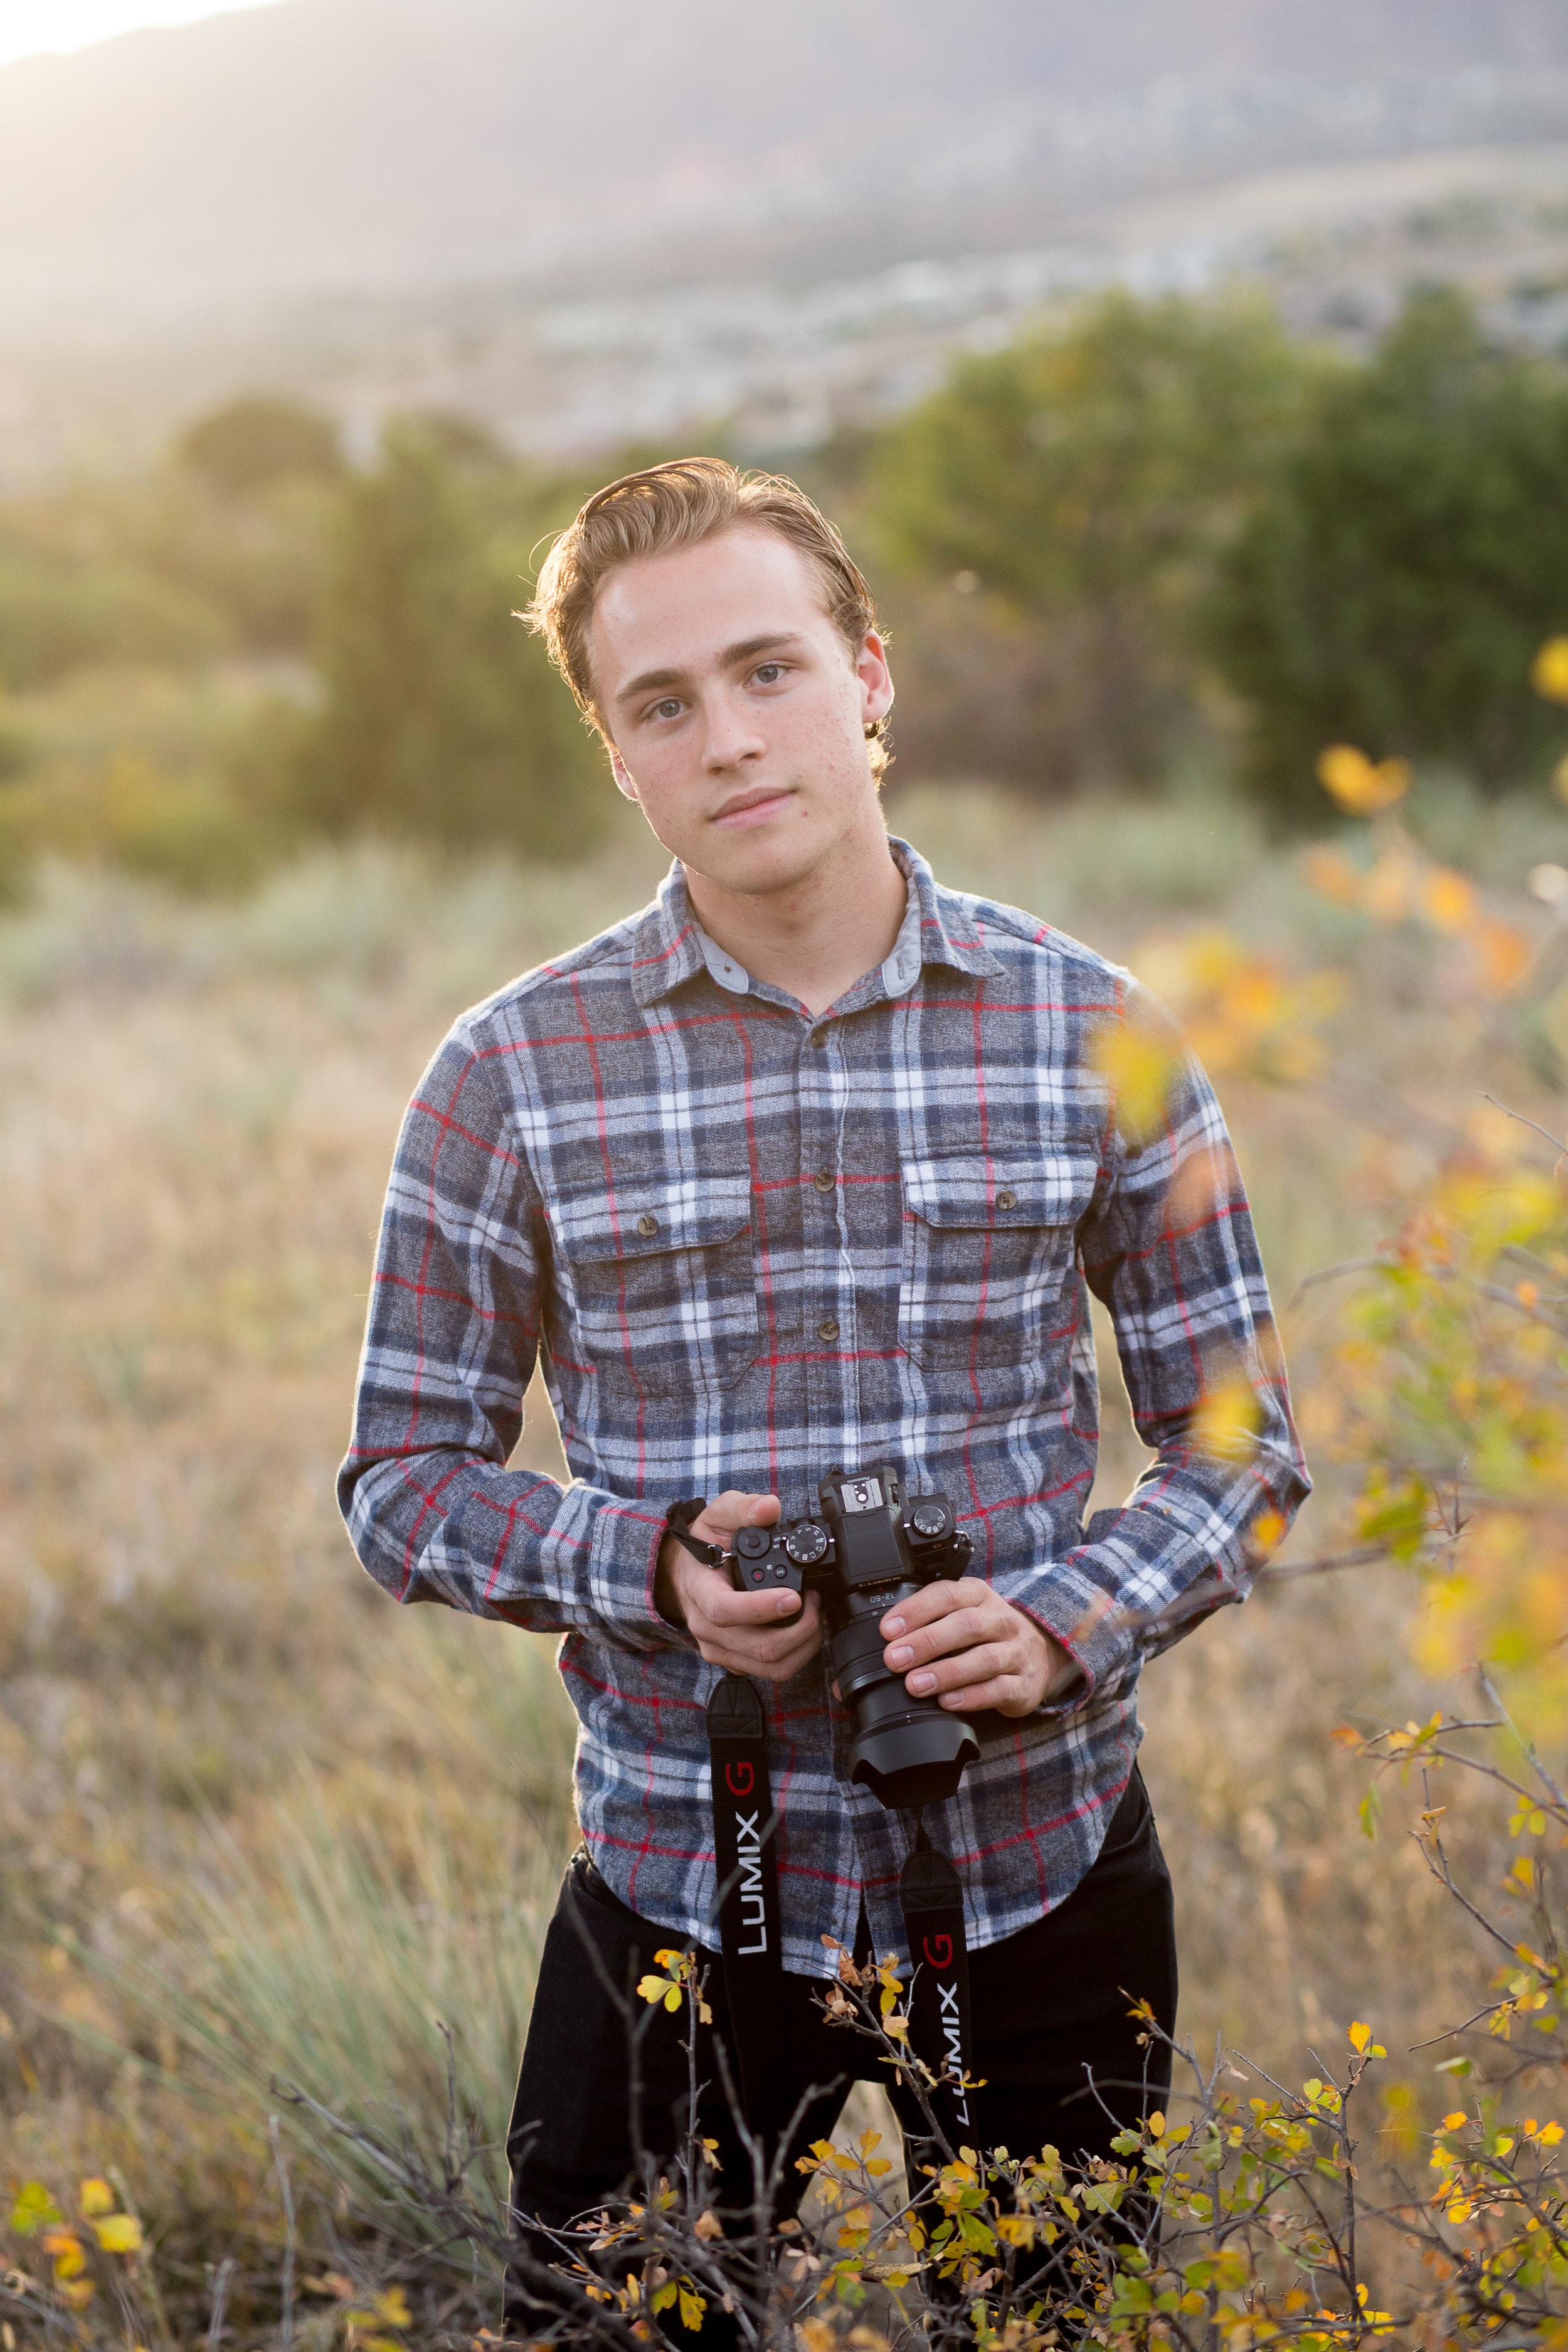 Senior boy standing in field | Colorado Springs Senior Photography | Colorado Springs Senior Photographer | Stacy Carosa Photography | Colorado Senior Portraits | Doherty High School